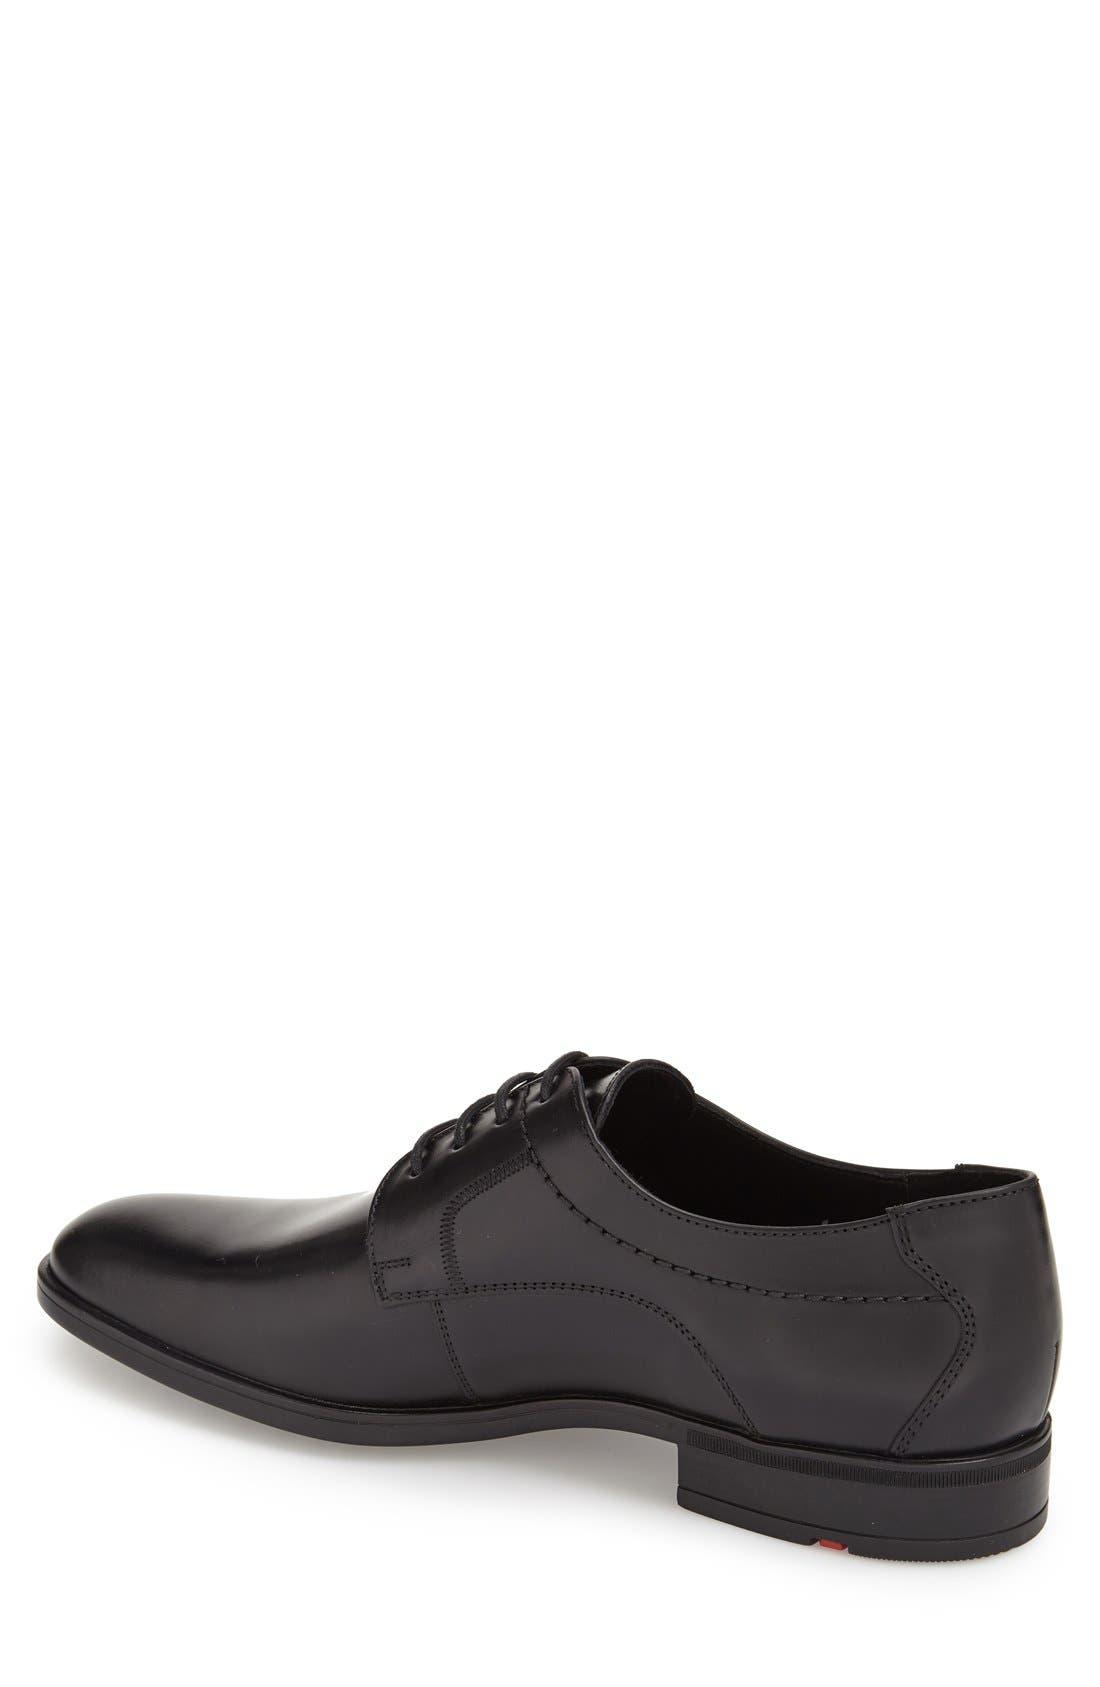 'Gildo' Plain Toe Derby,                             Alternate thumbnail 2, color,                             Black